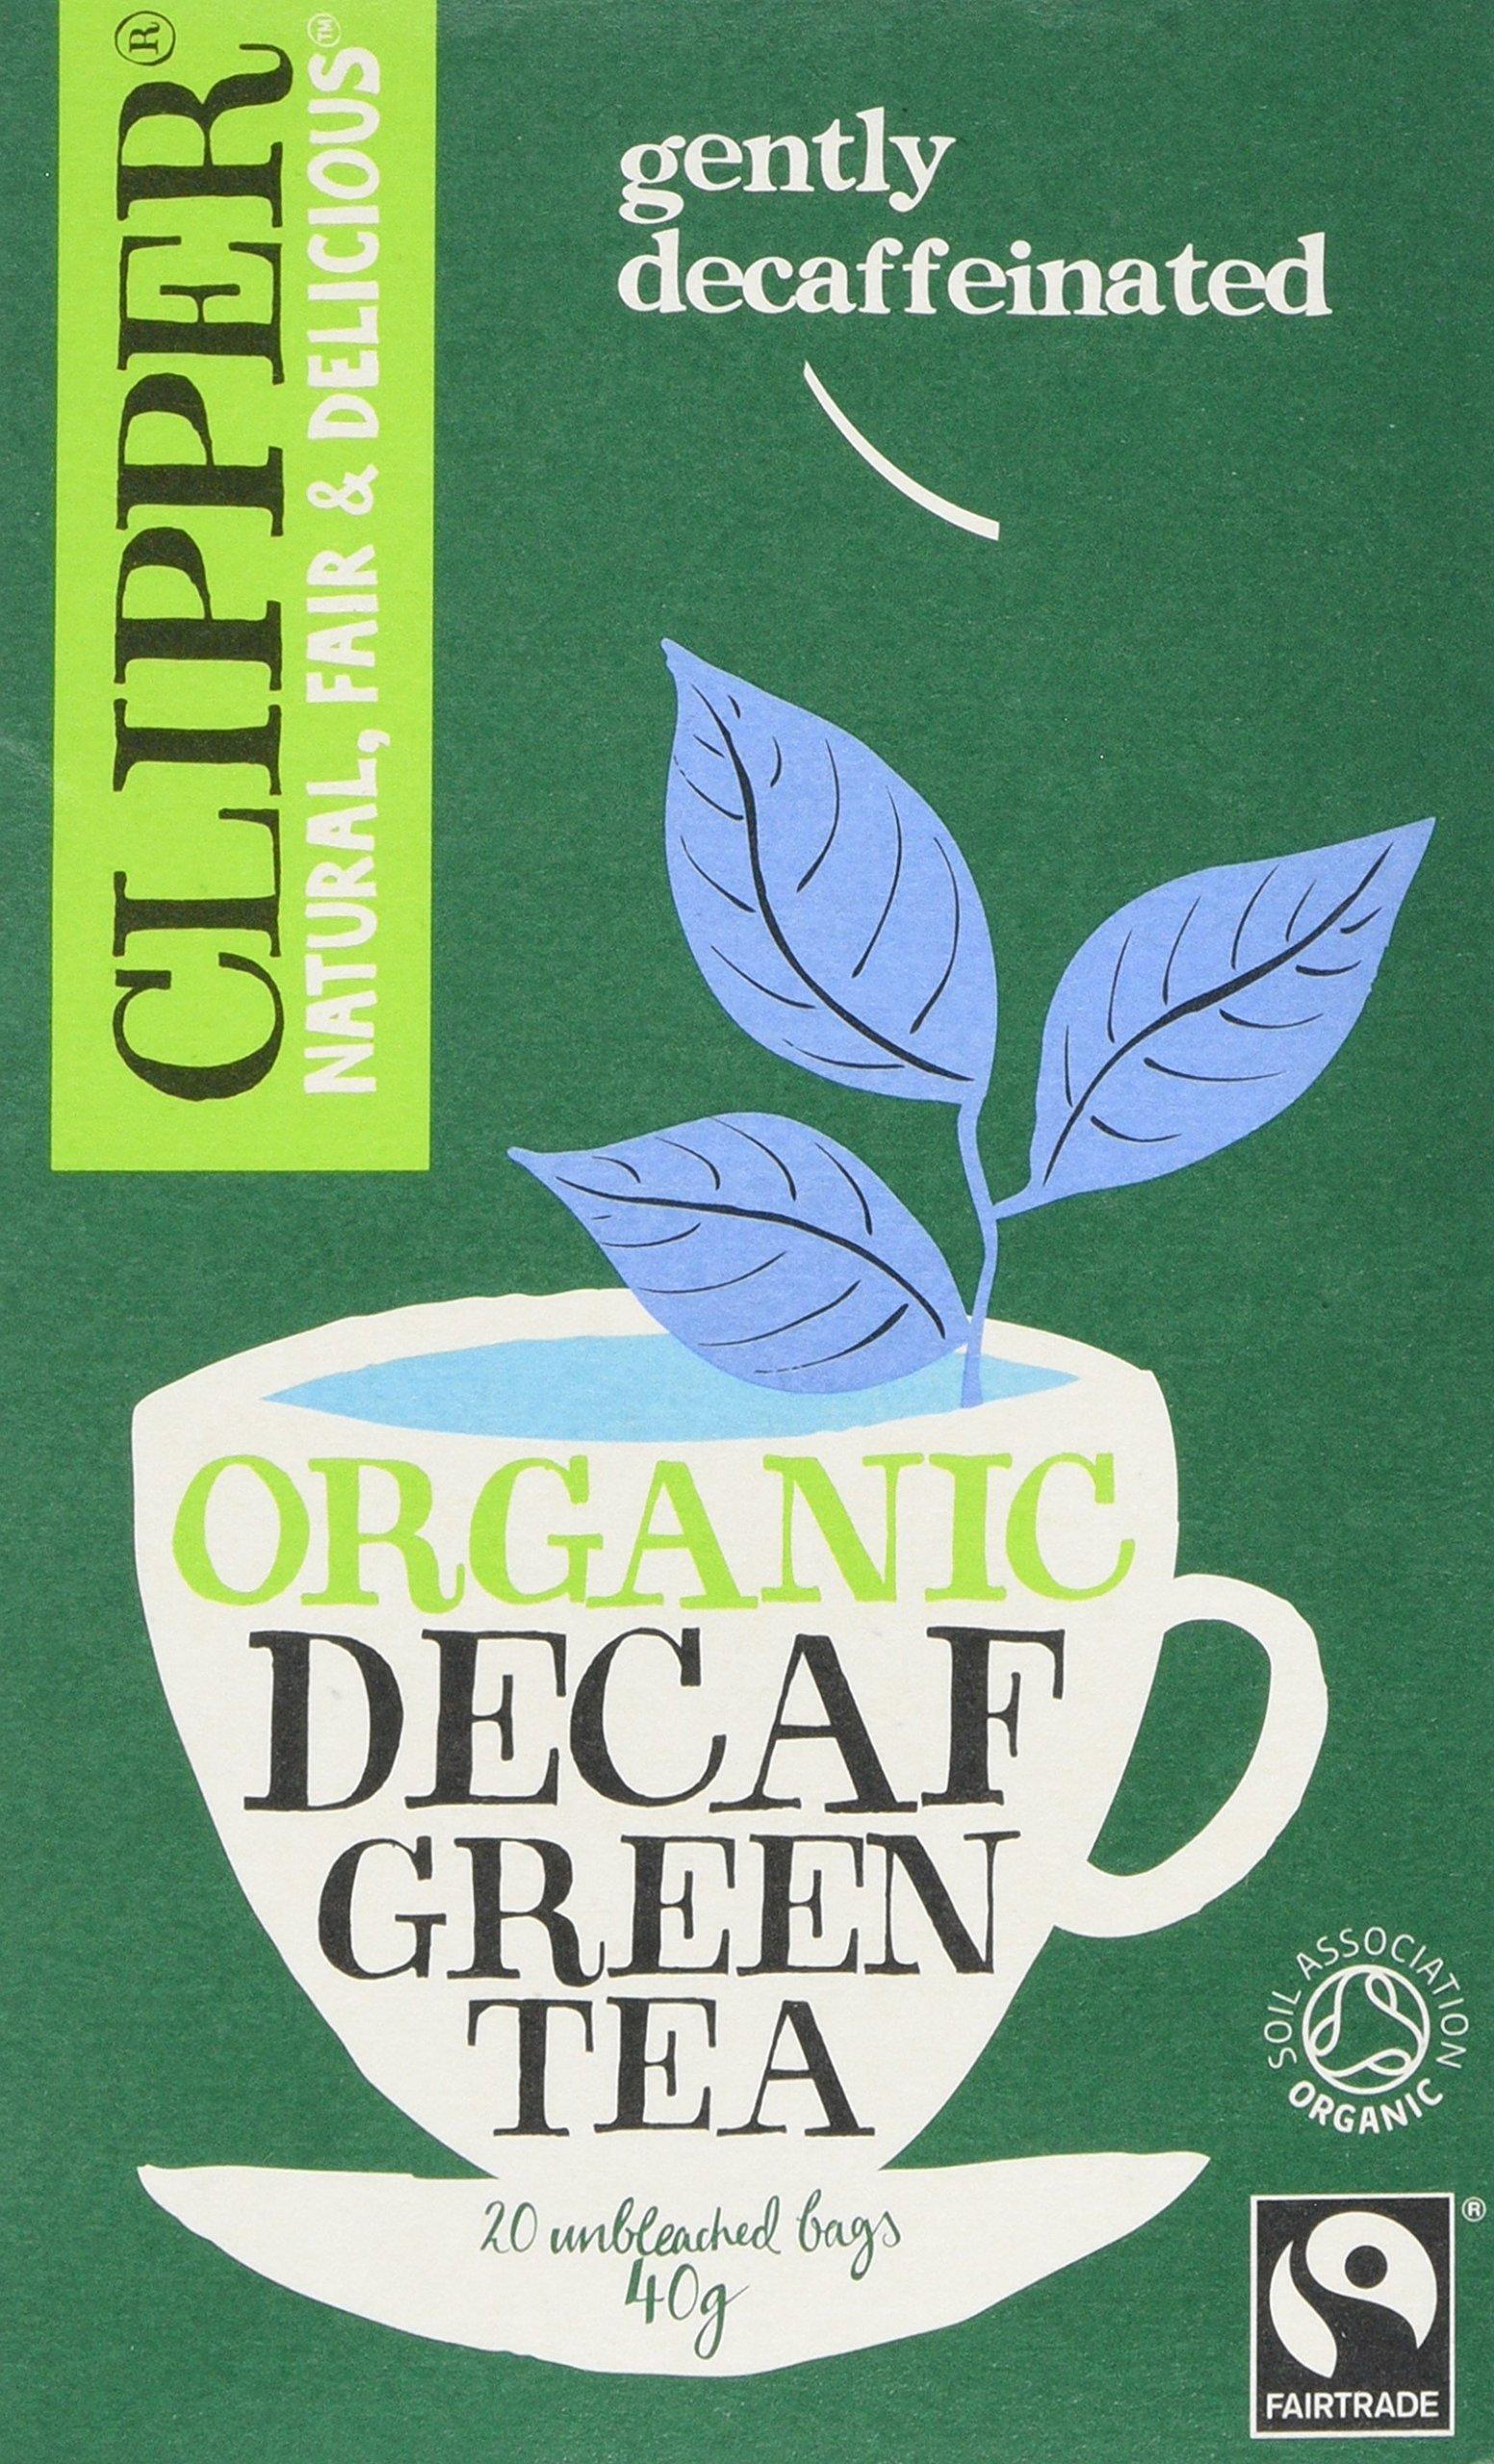 Clipper organic fairtrade green tea bundle (fairtrade, soil association) (green tea) (6 packs of 20 bags) (120 bags) (brews in 1-3 minutes)